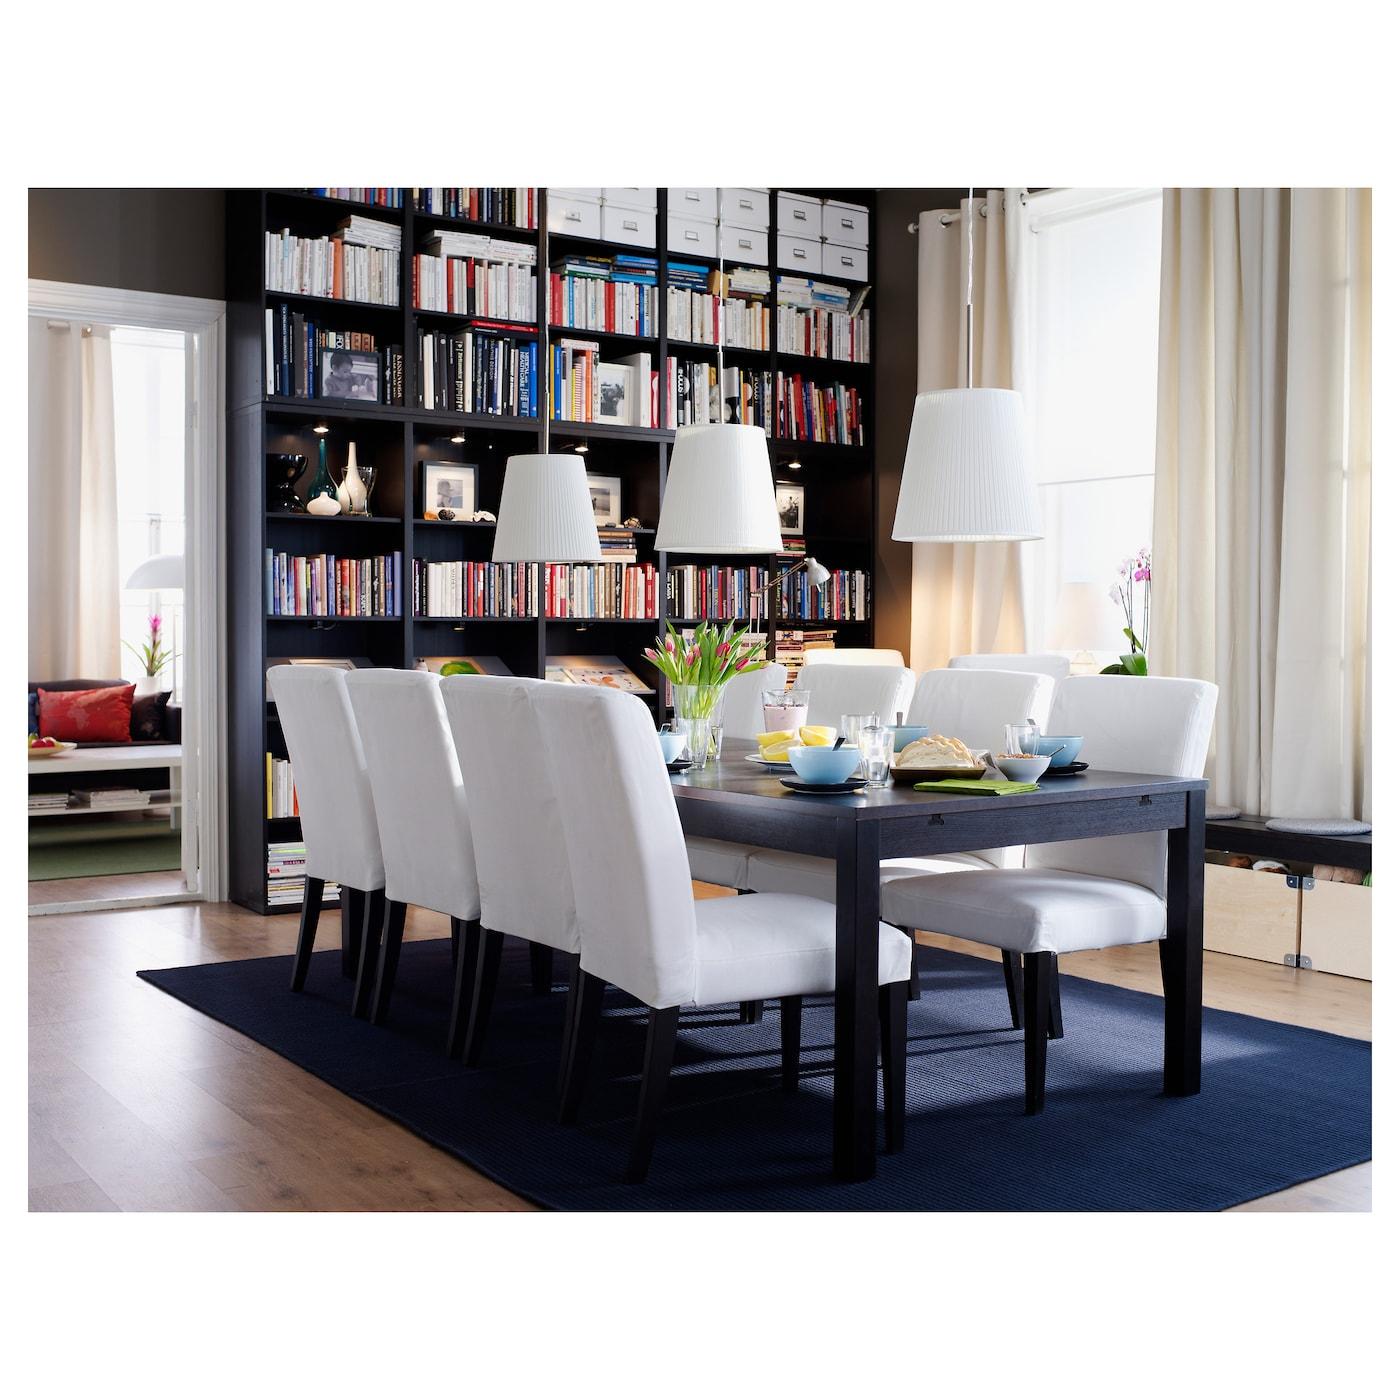 ek s abat jour blanc cass 34 cm ikea. Black Bedroom Furniture Sets. Home Design Ideas